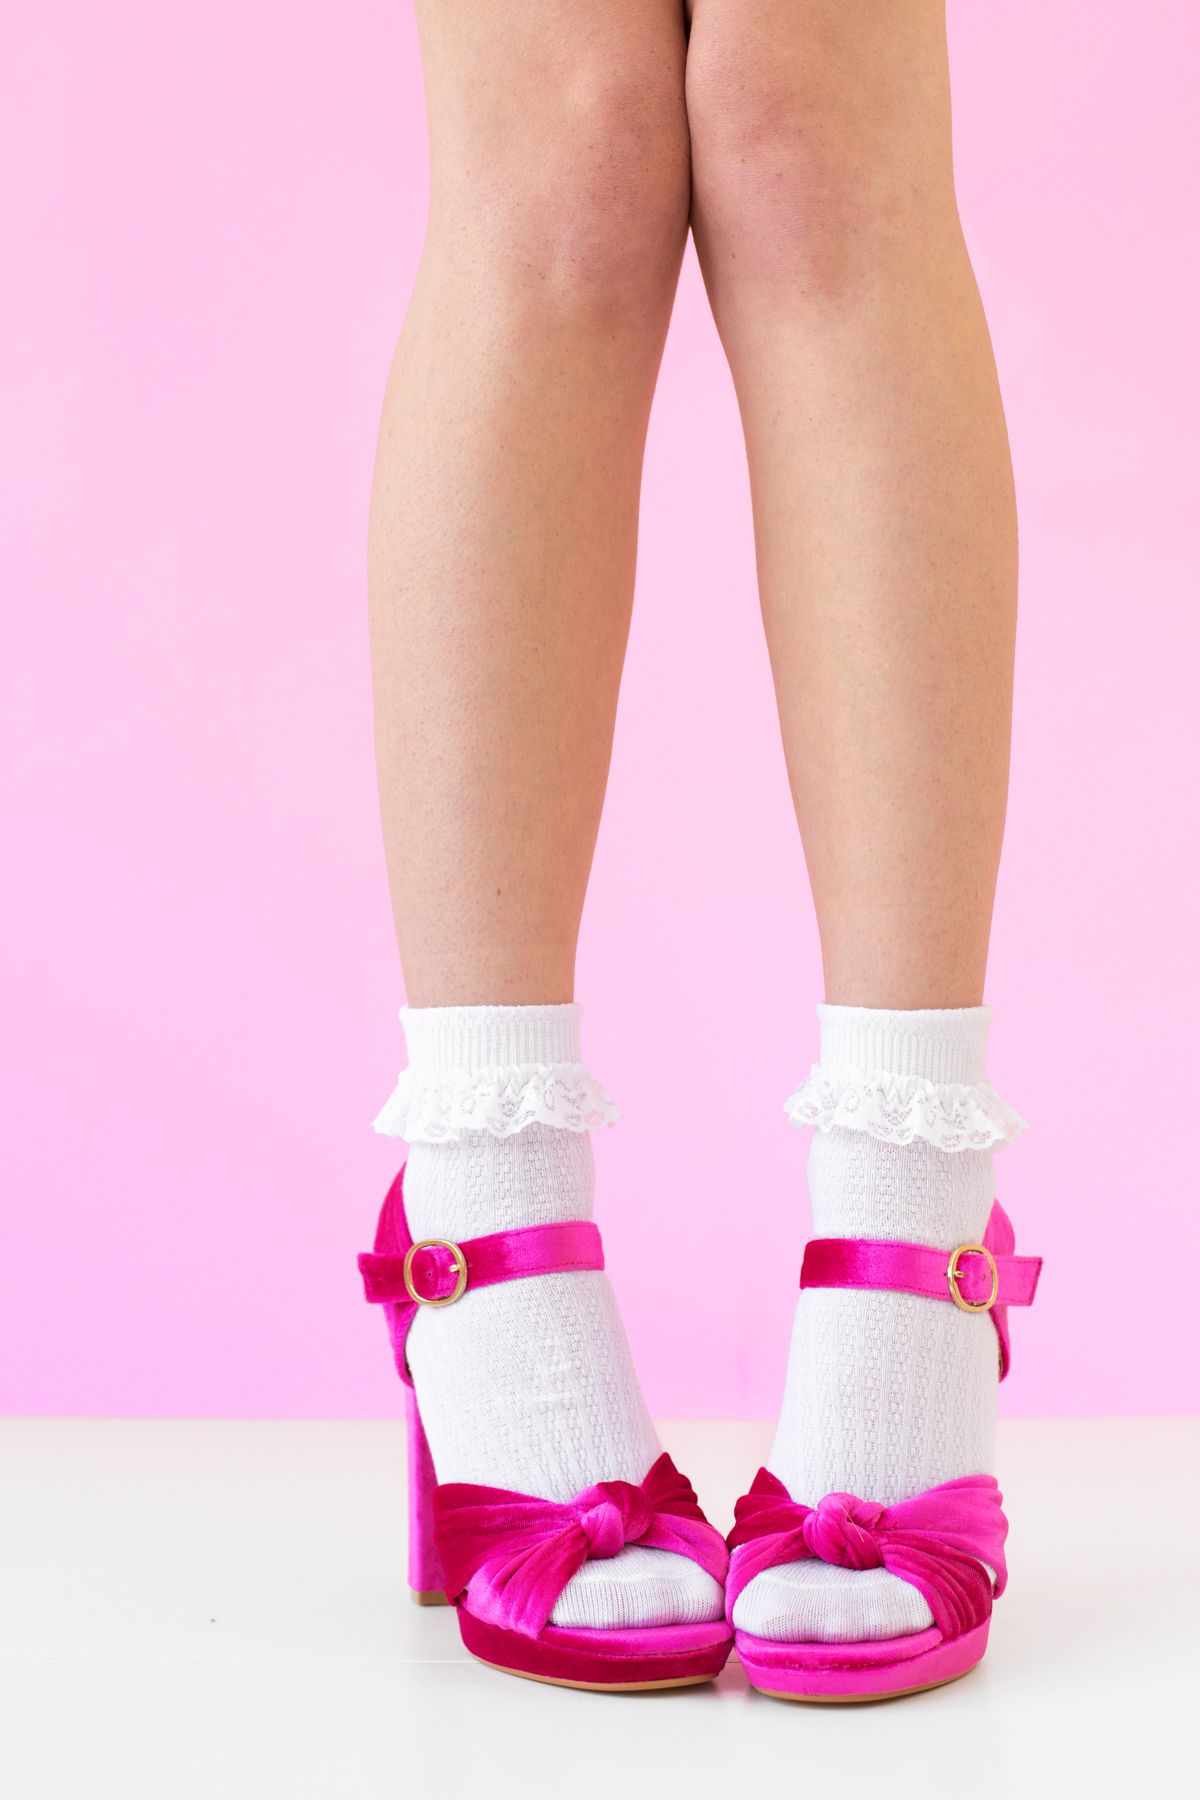 Pair of Sheer Mesh Soft Ankle Hi Socks Lolita Pin-Up Vintage Floral Top /& Toes